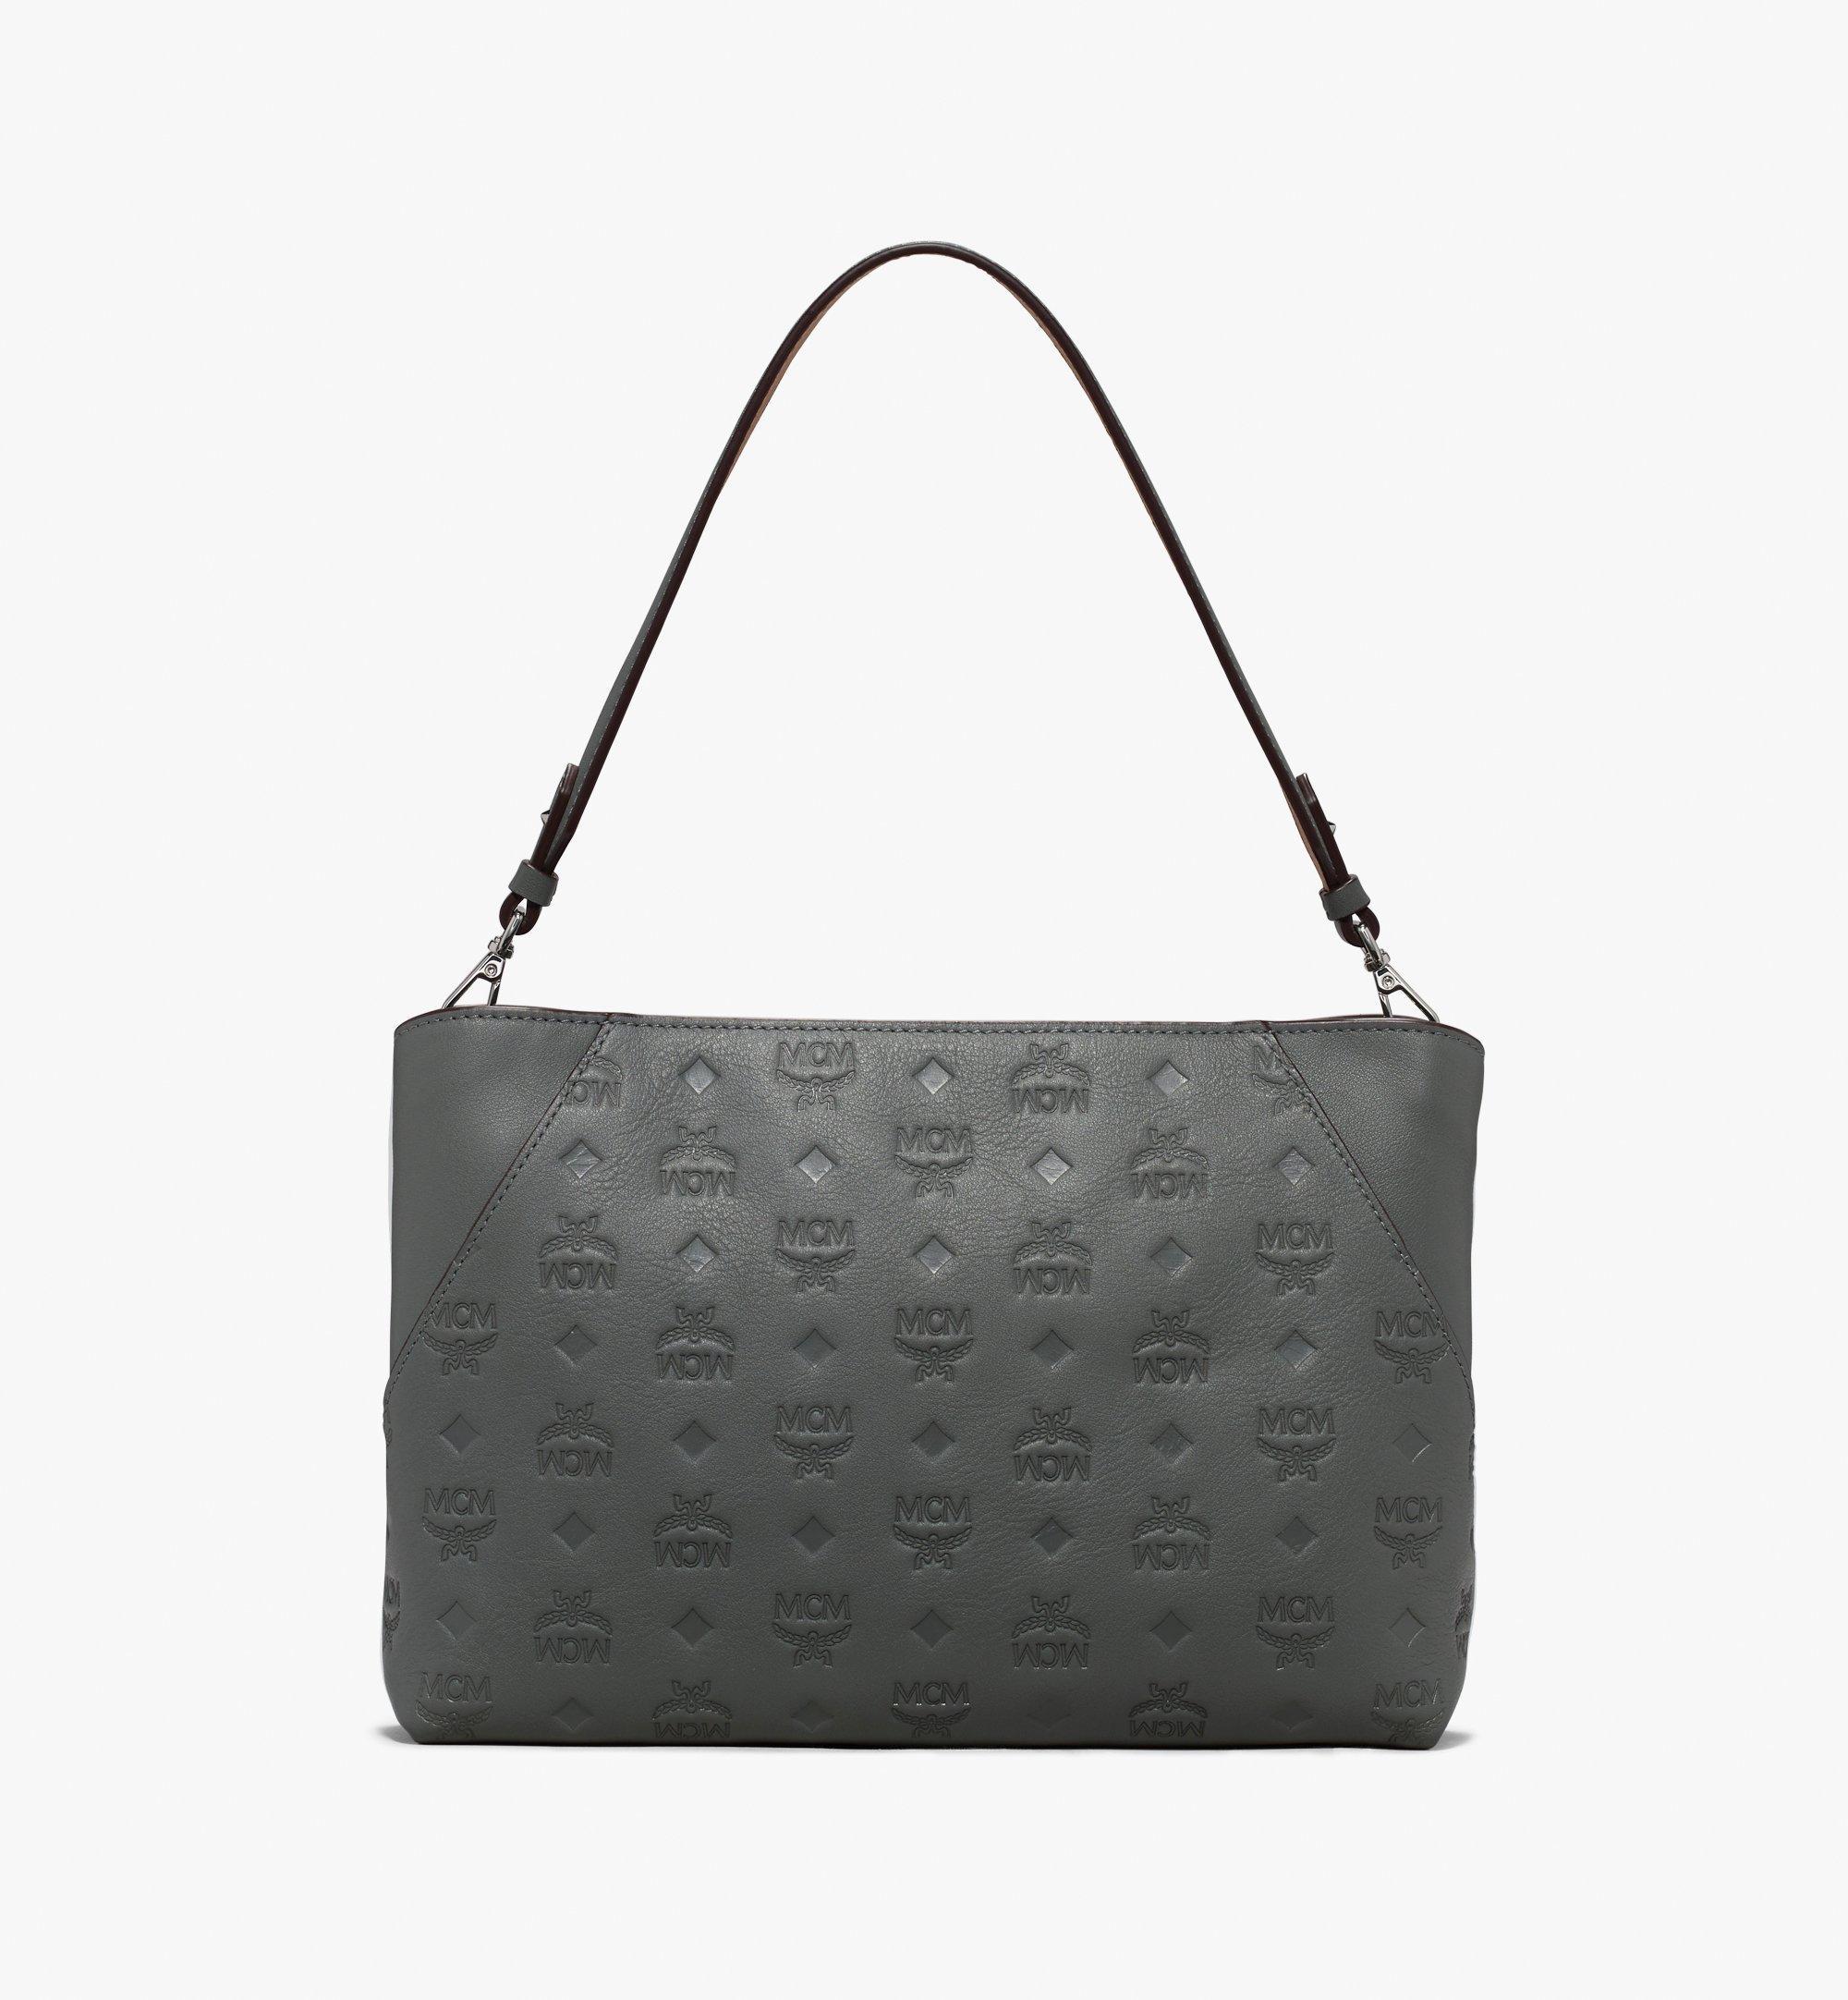 MCM Klara Shoulder Bag Grey MWS9AKM79EC001 Alternate View 1